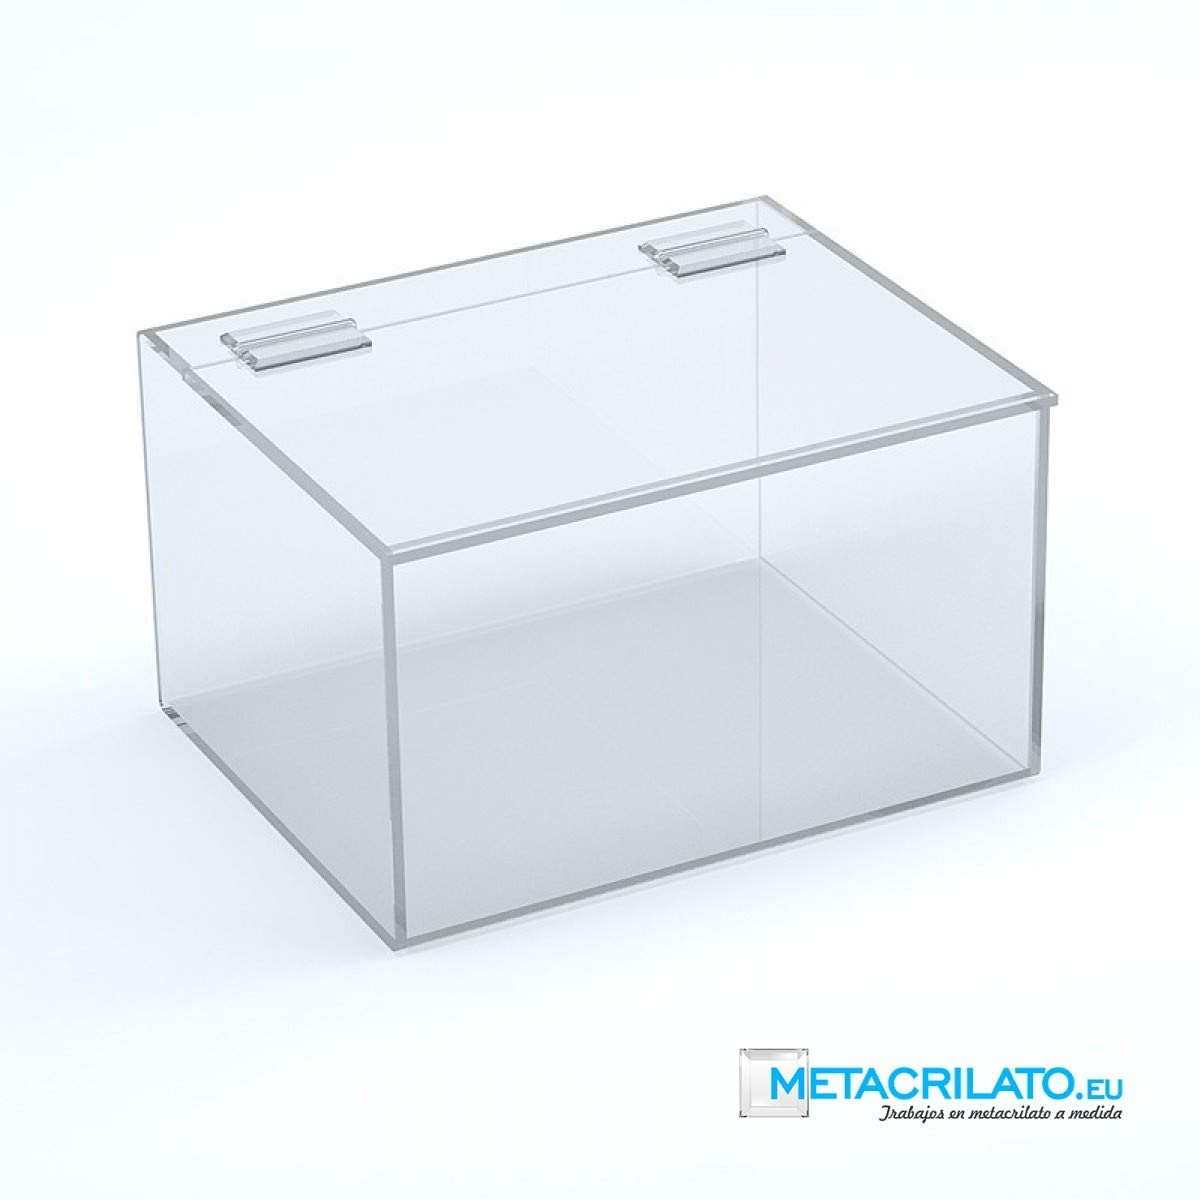 METACRILATO.EU Caramelera Beta 25 x 20 x 15 cm: Amazon.es: Oficina y papelería